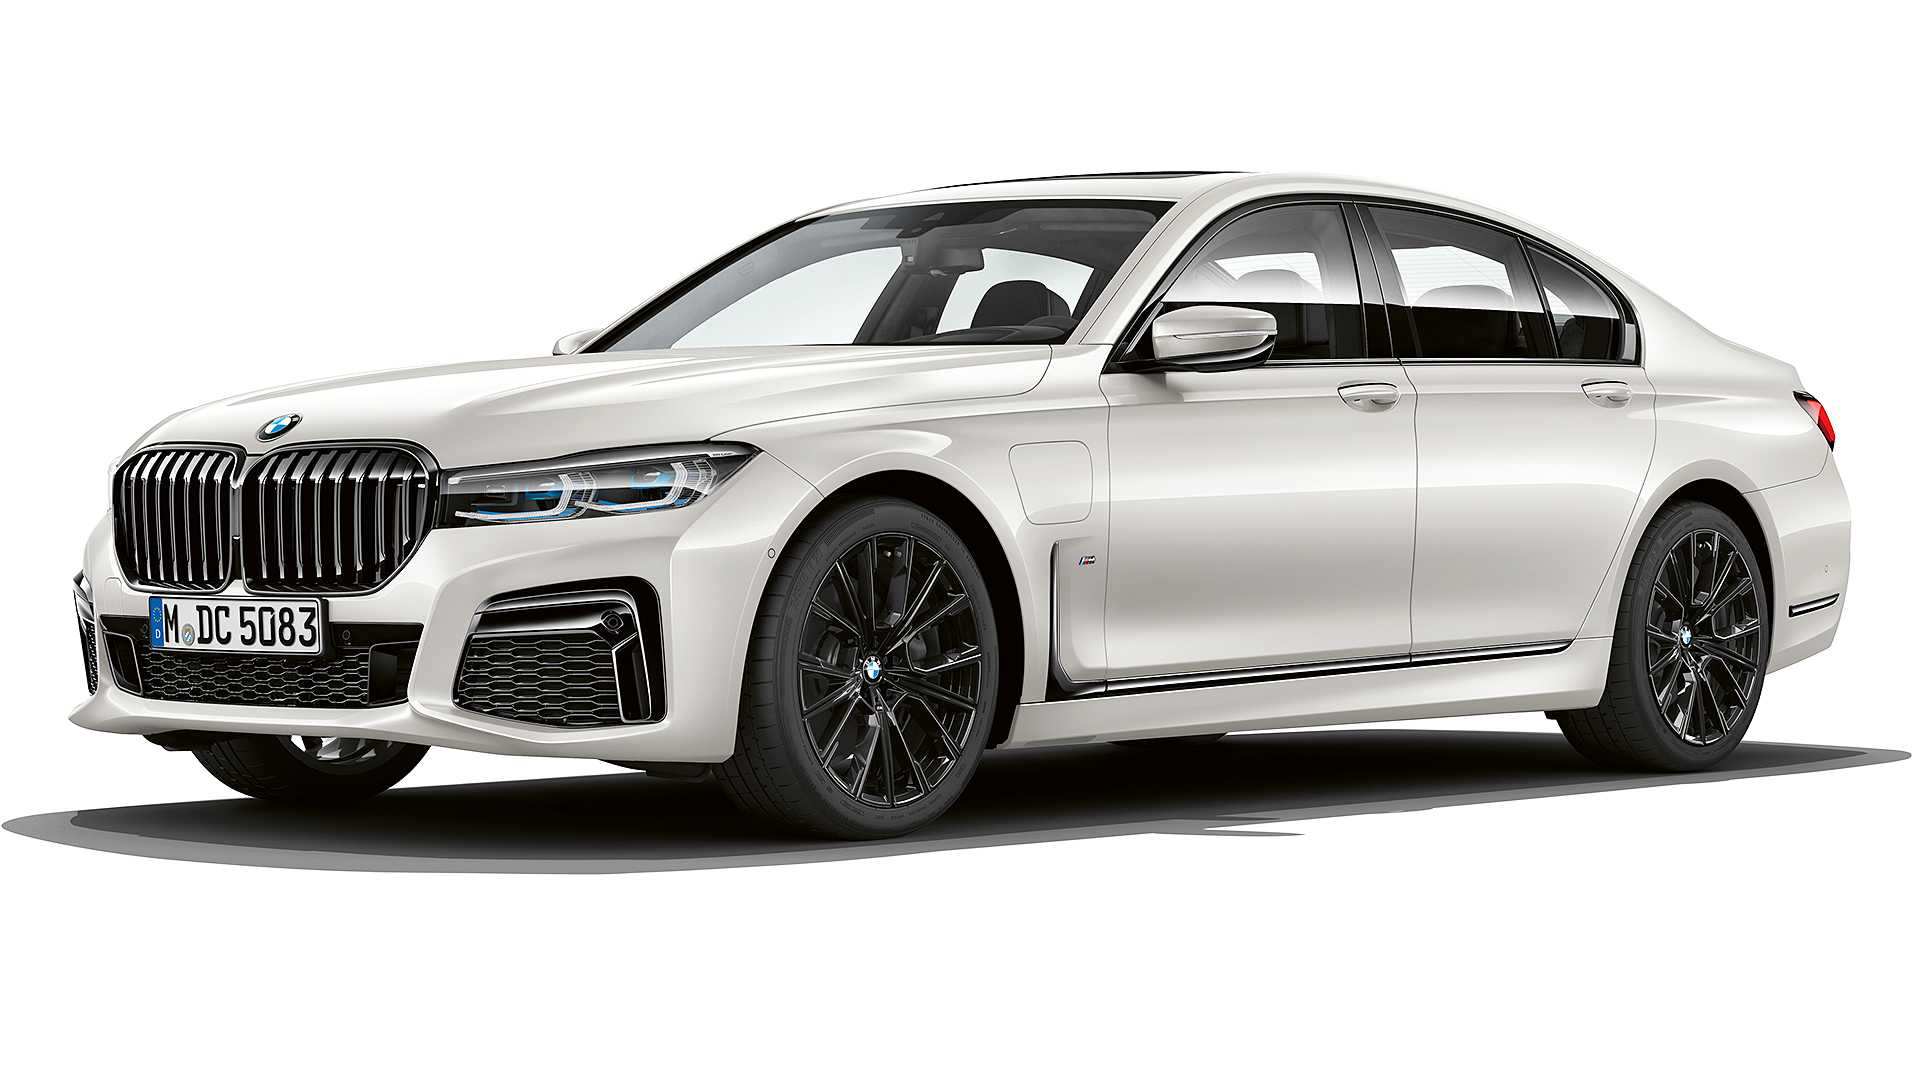 2020 BMW 7 Series Wallpapers - Top Free 2020 BMW 7 Series ...